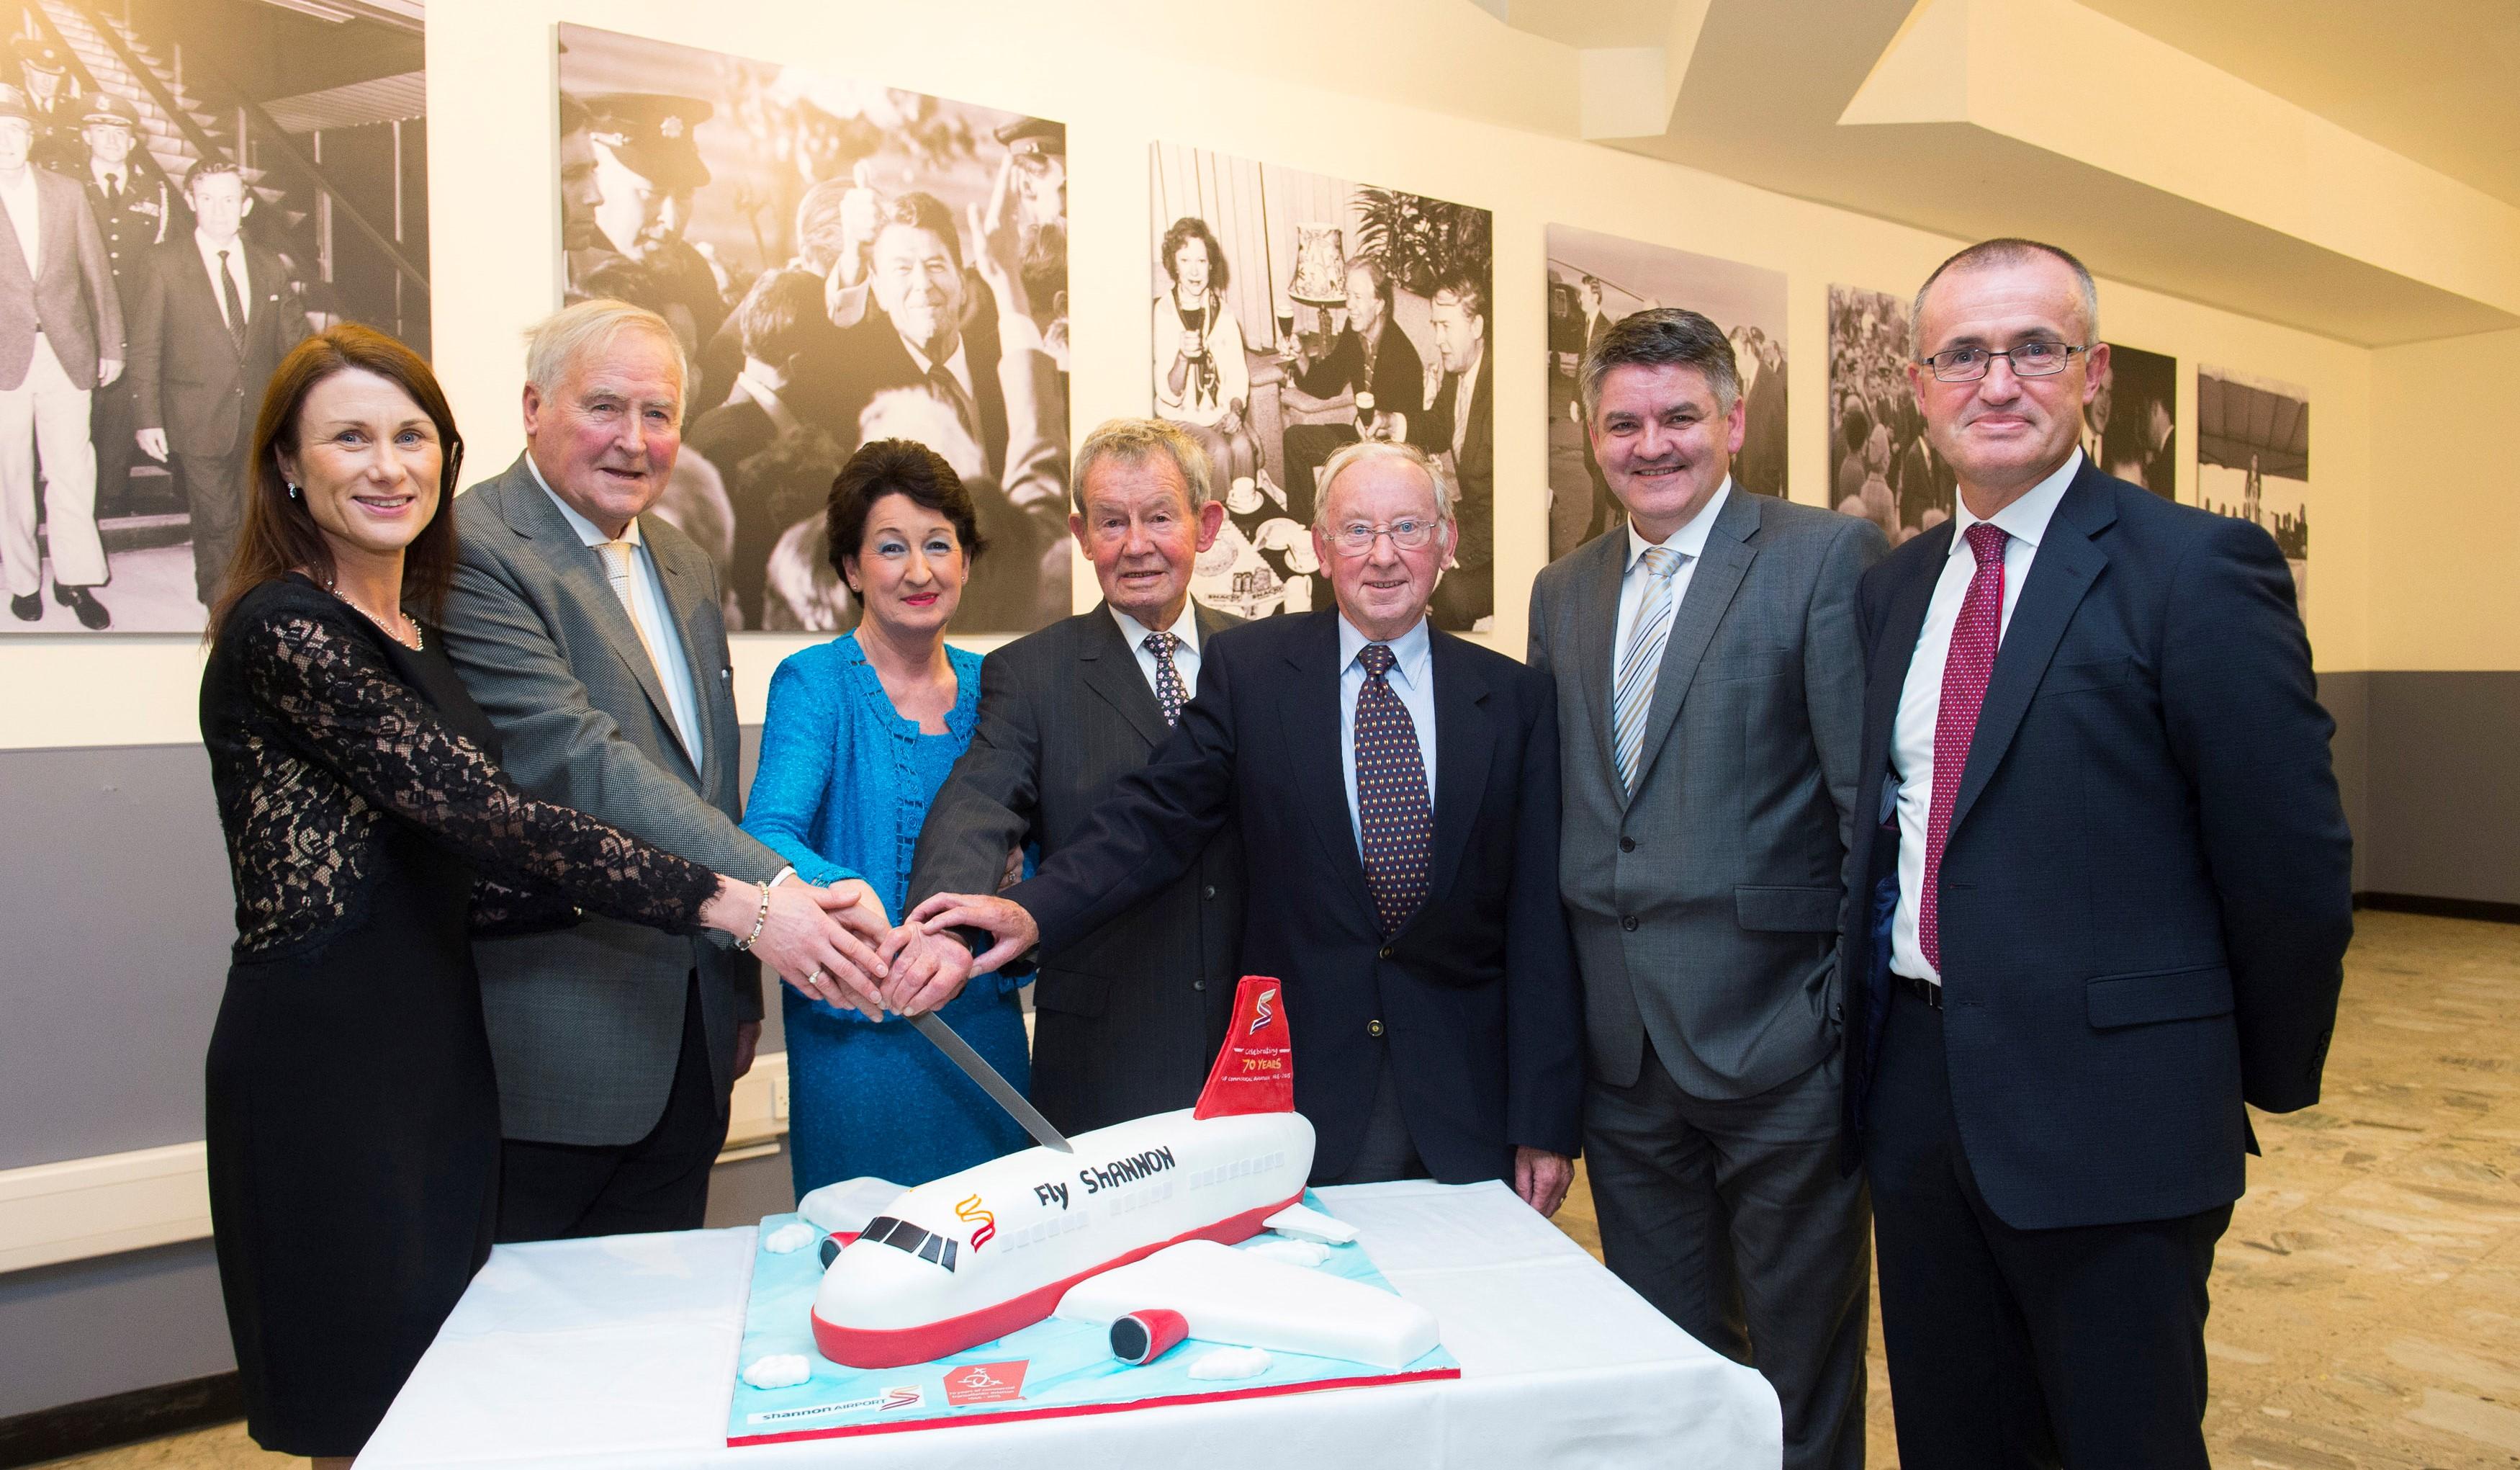 Shannon Airport 70 year milestone celebration